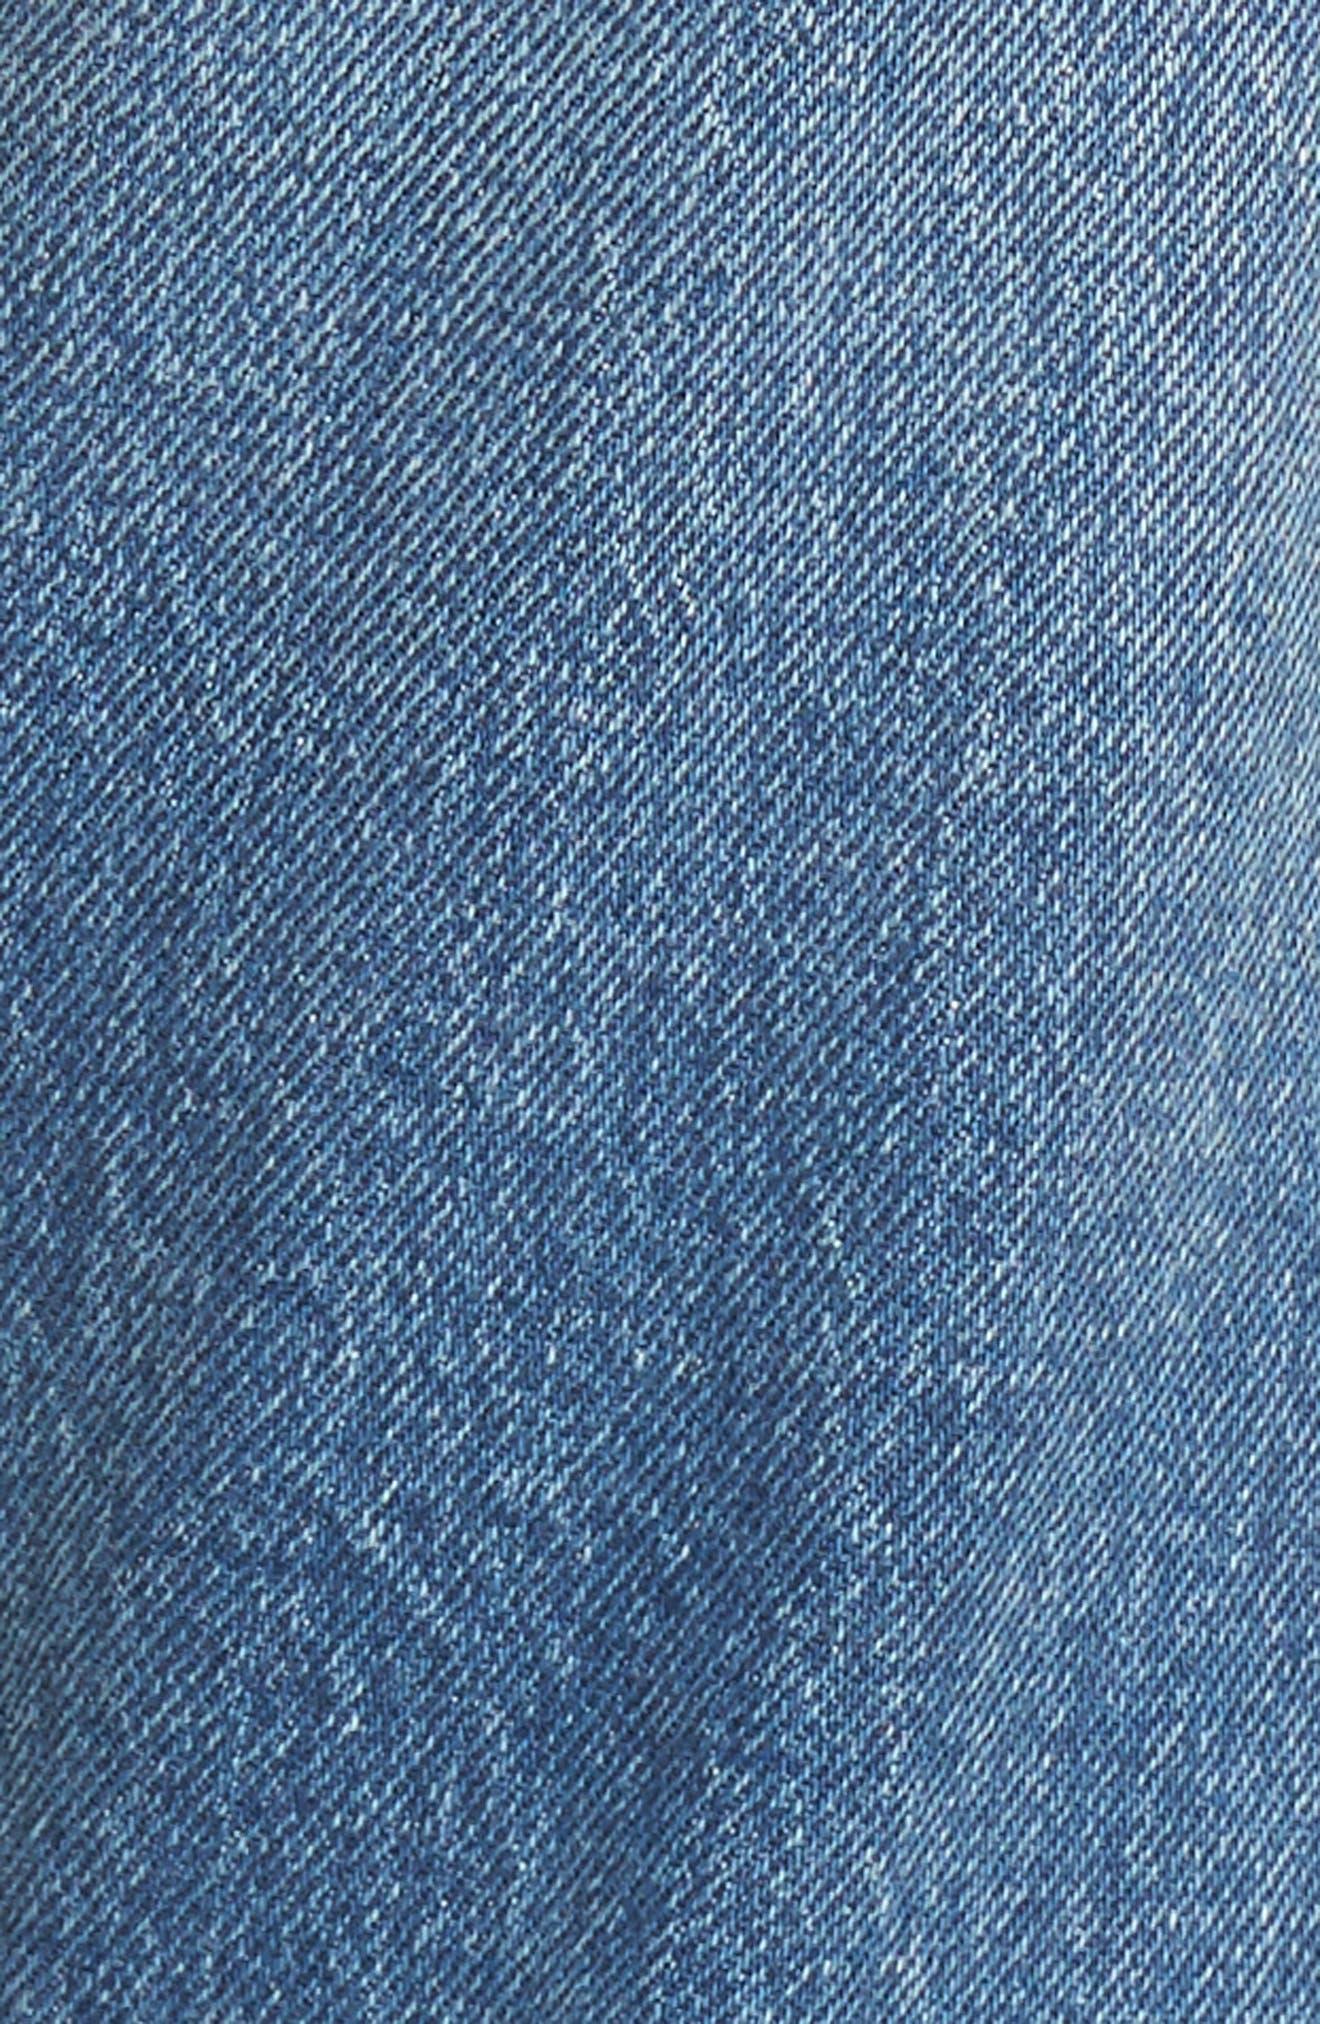 Alternate Image 5  - Levi's® 501 High Waist Skinny Jeans (Leave a Trace)